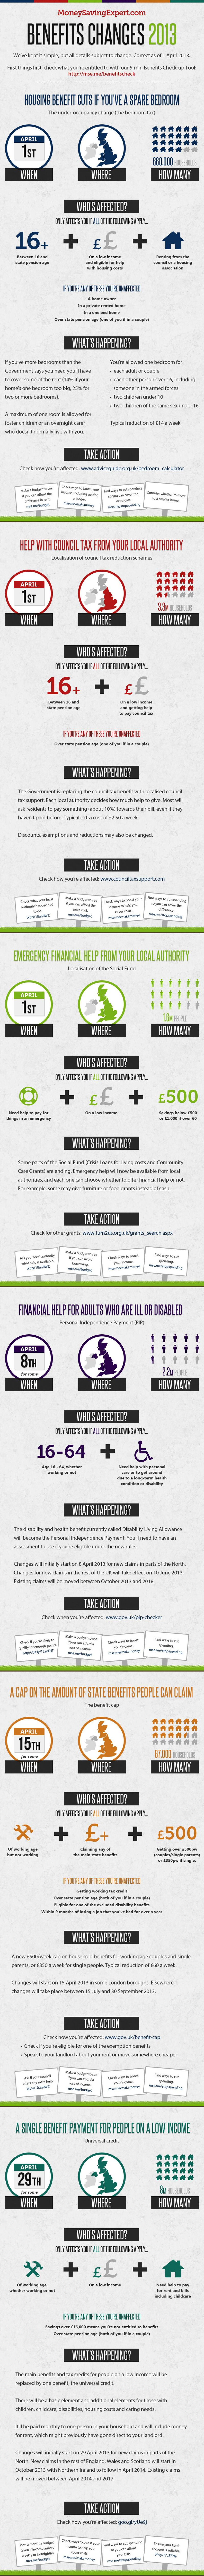 MoneySavingExpert.com Benefits Infographic